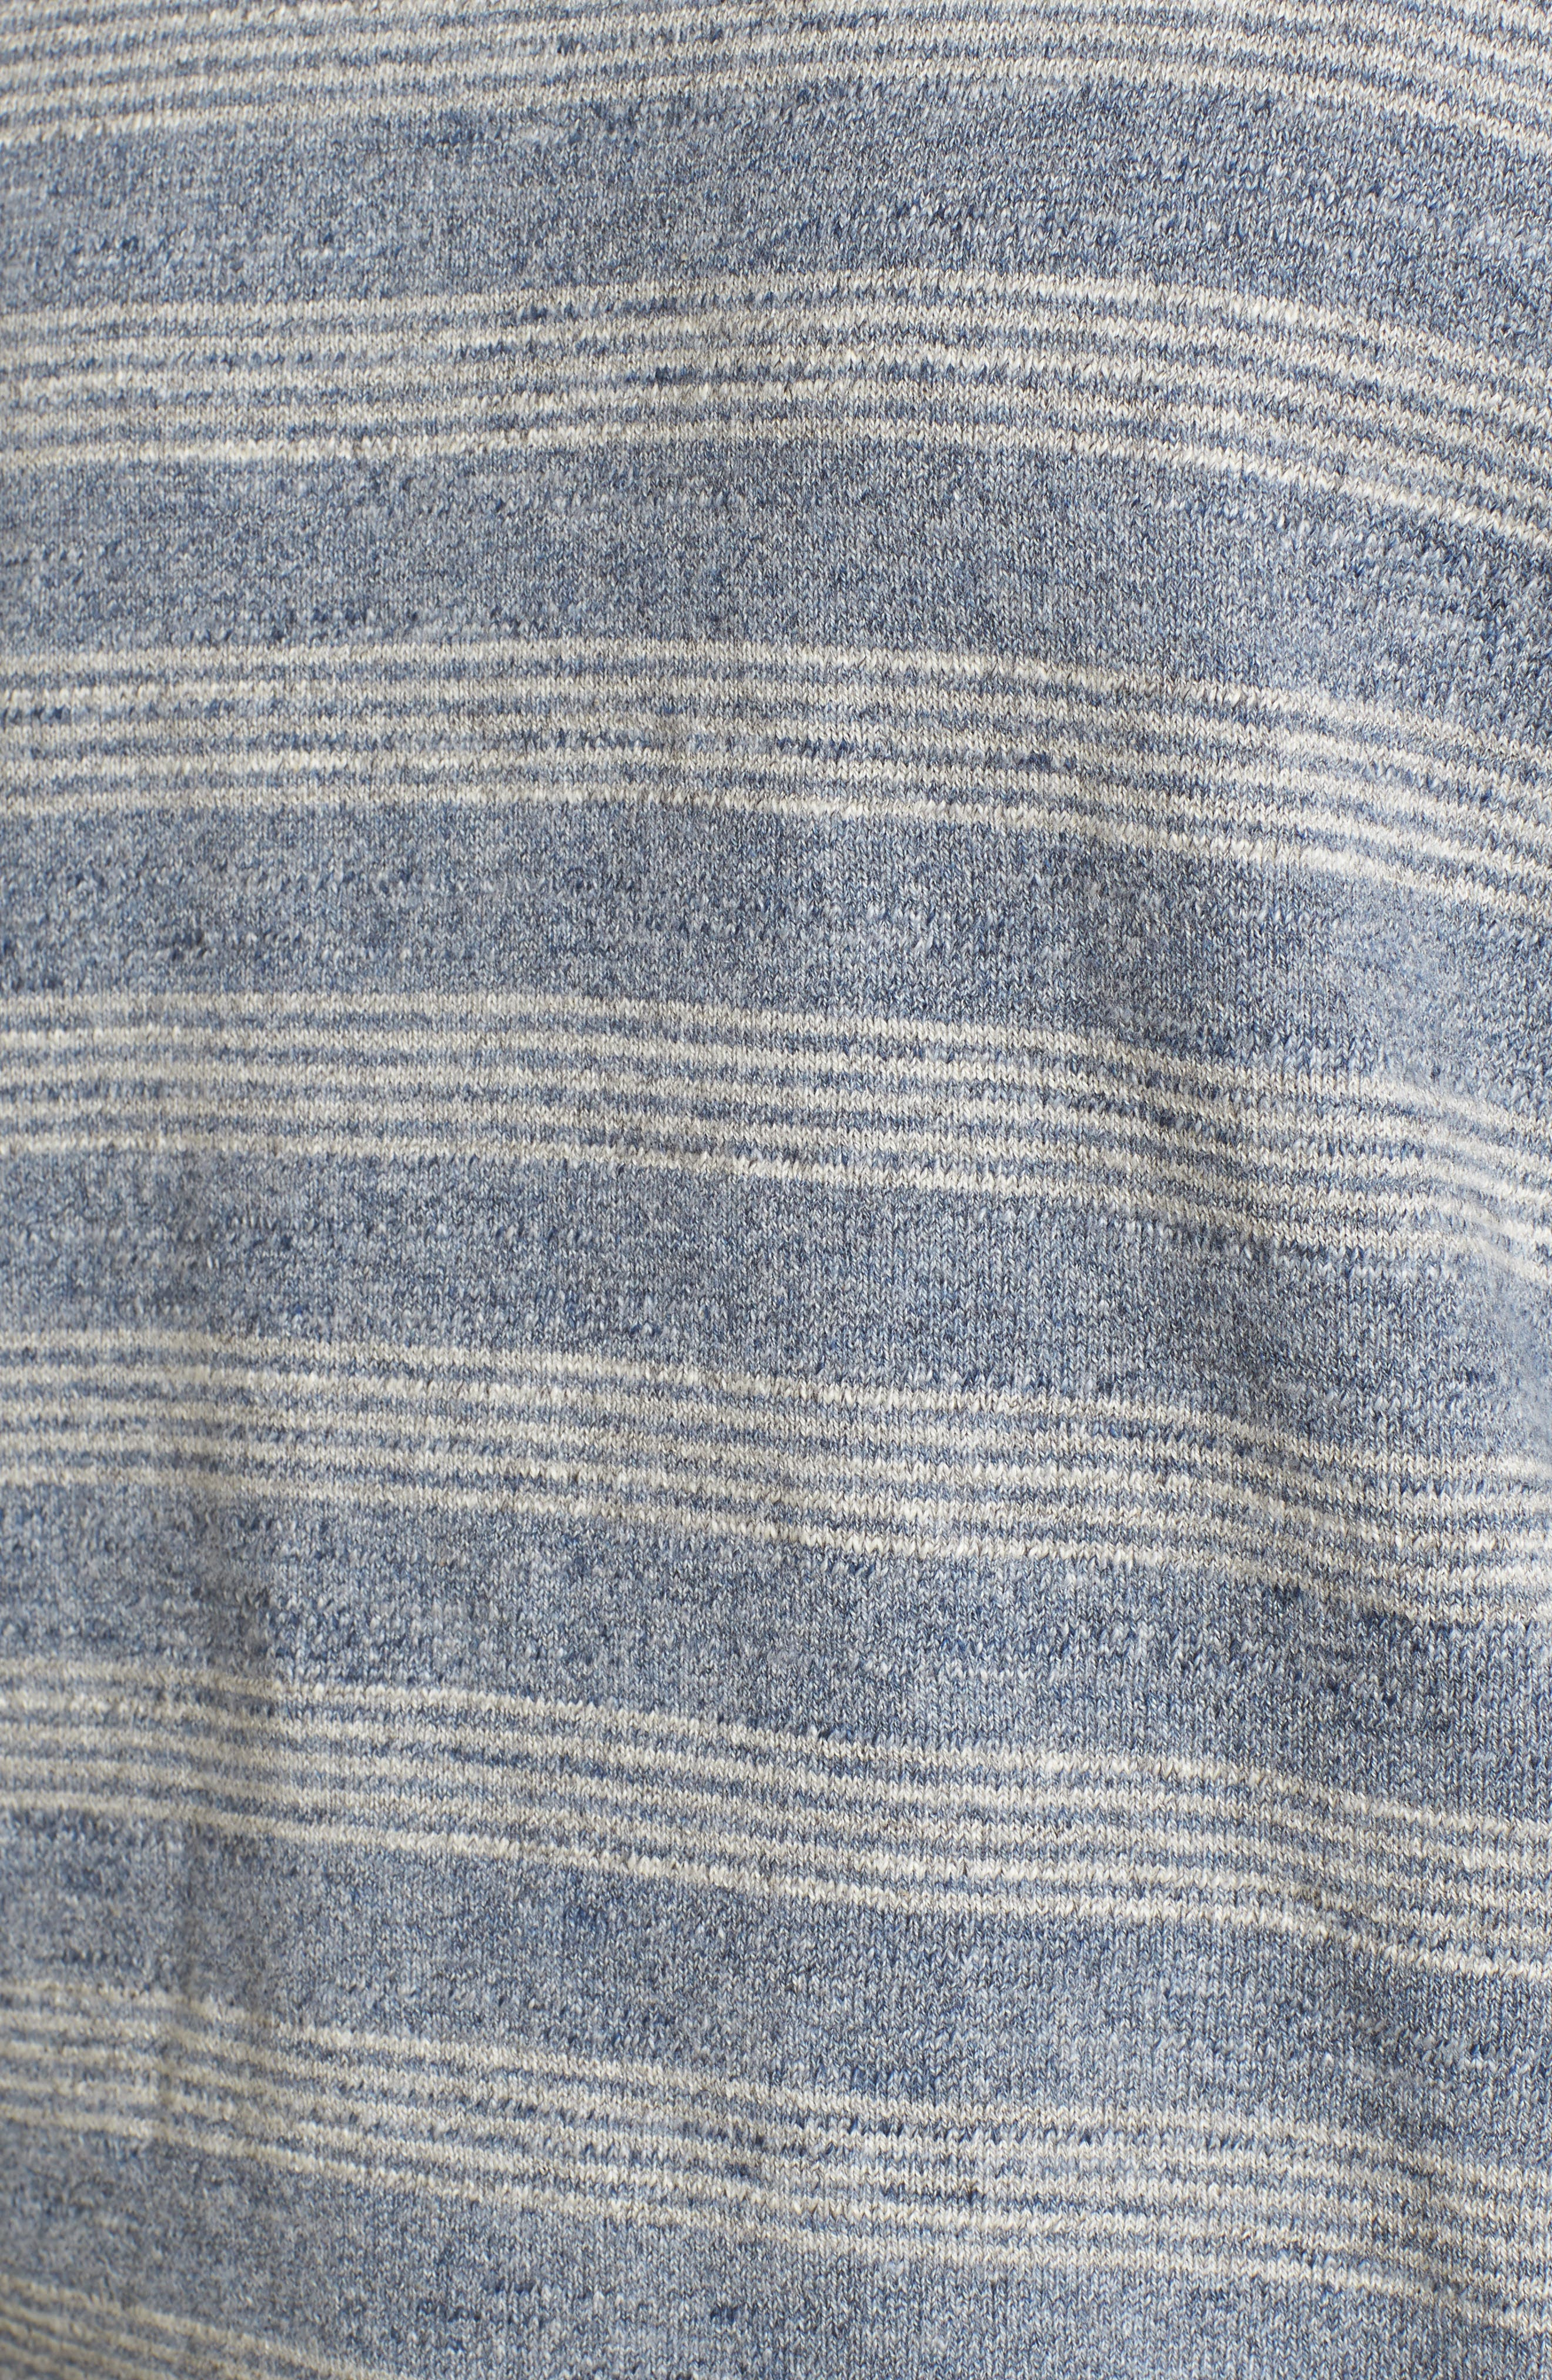 Stripe Cotton Sweater,                             Alternate thumbnail 5, color,                             Blue Grey Heather Stripe